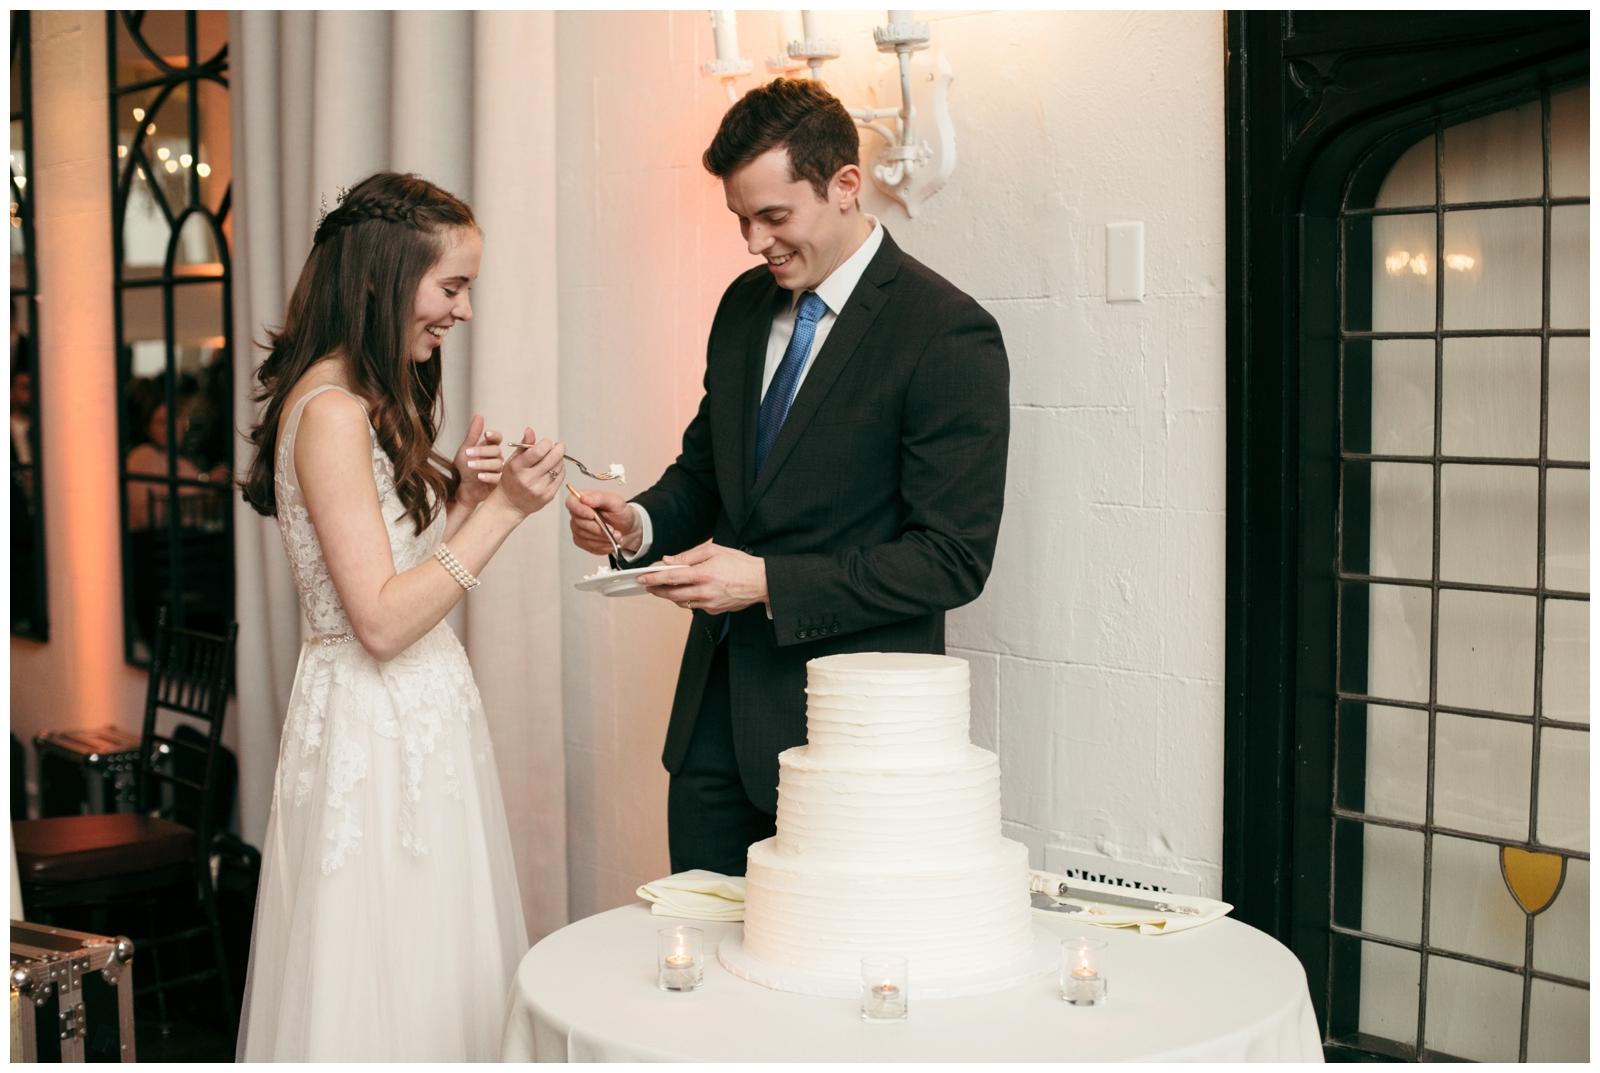 Alden-Castle-Wedding-Boston-Bailey-Q-Photo-056.jpg